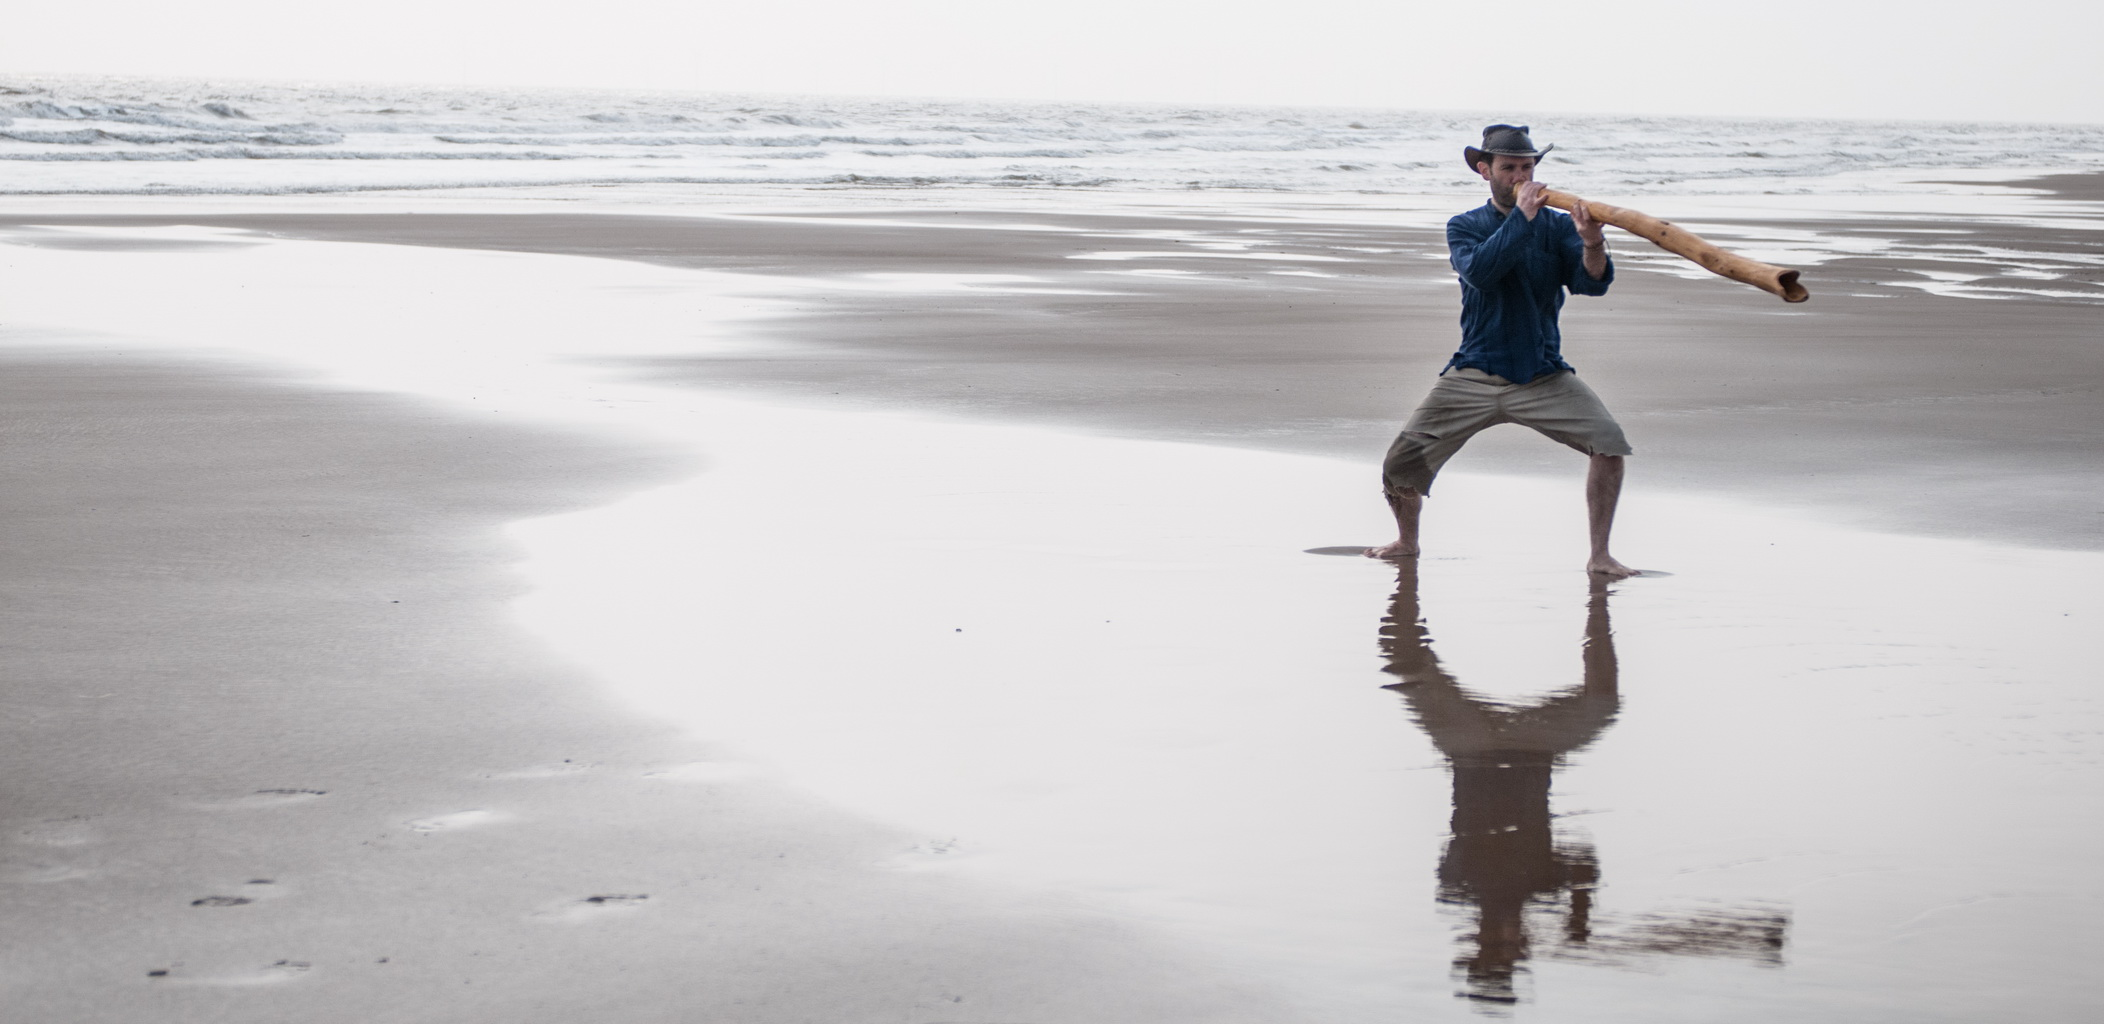 (C) Darren Juggins Photography Group